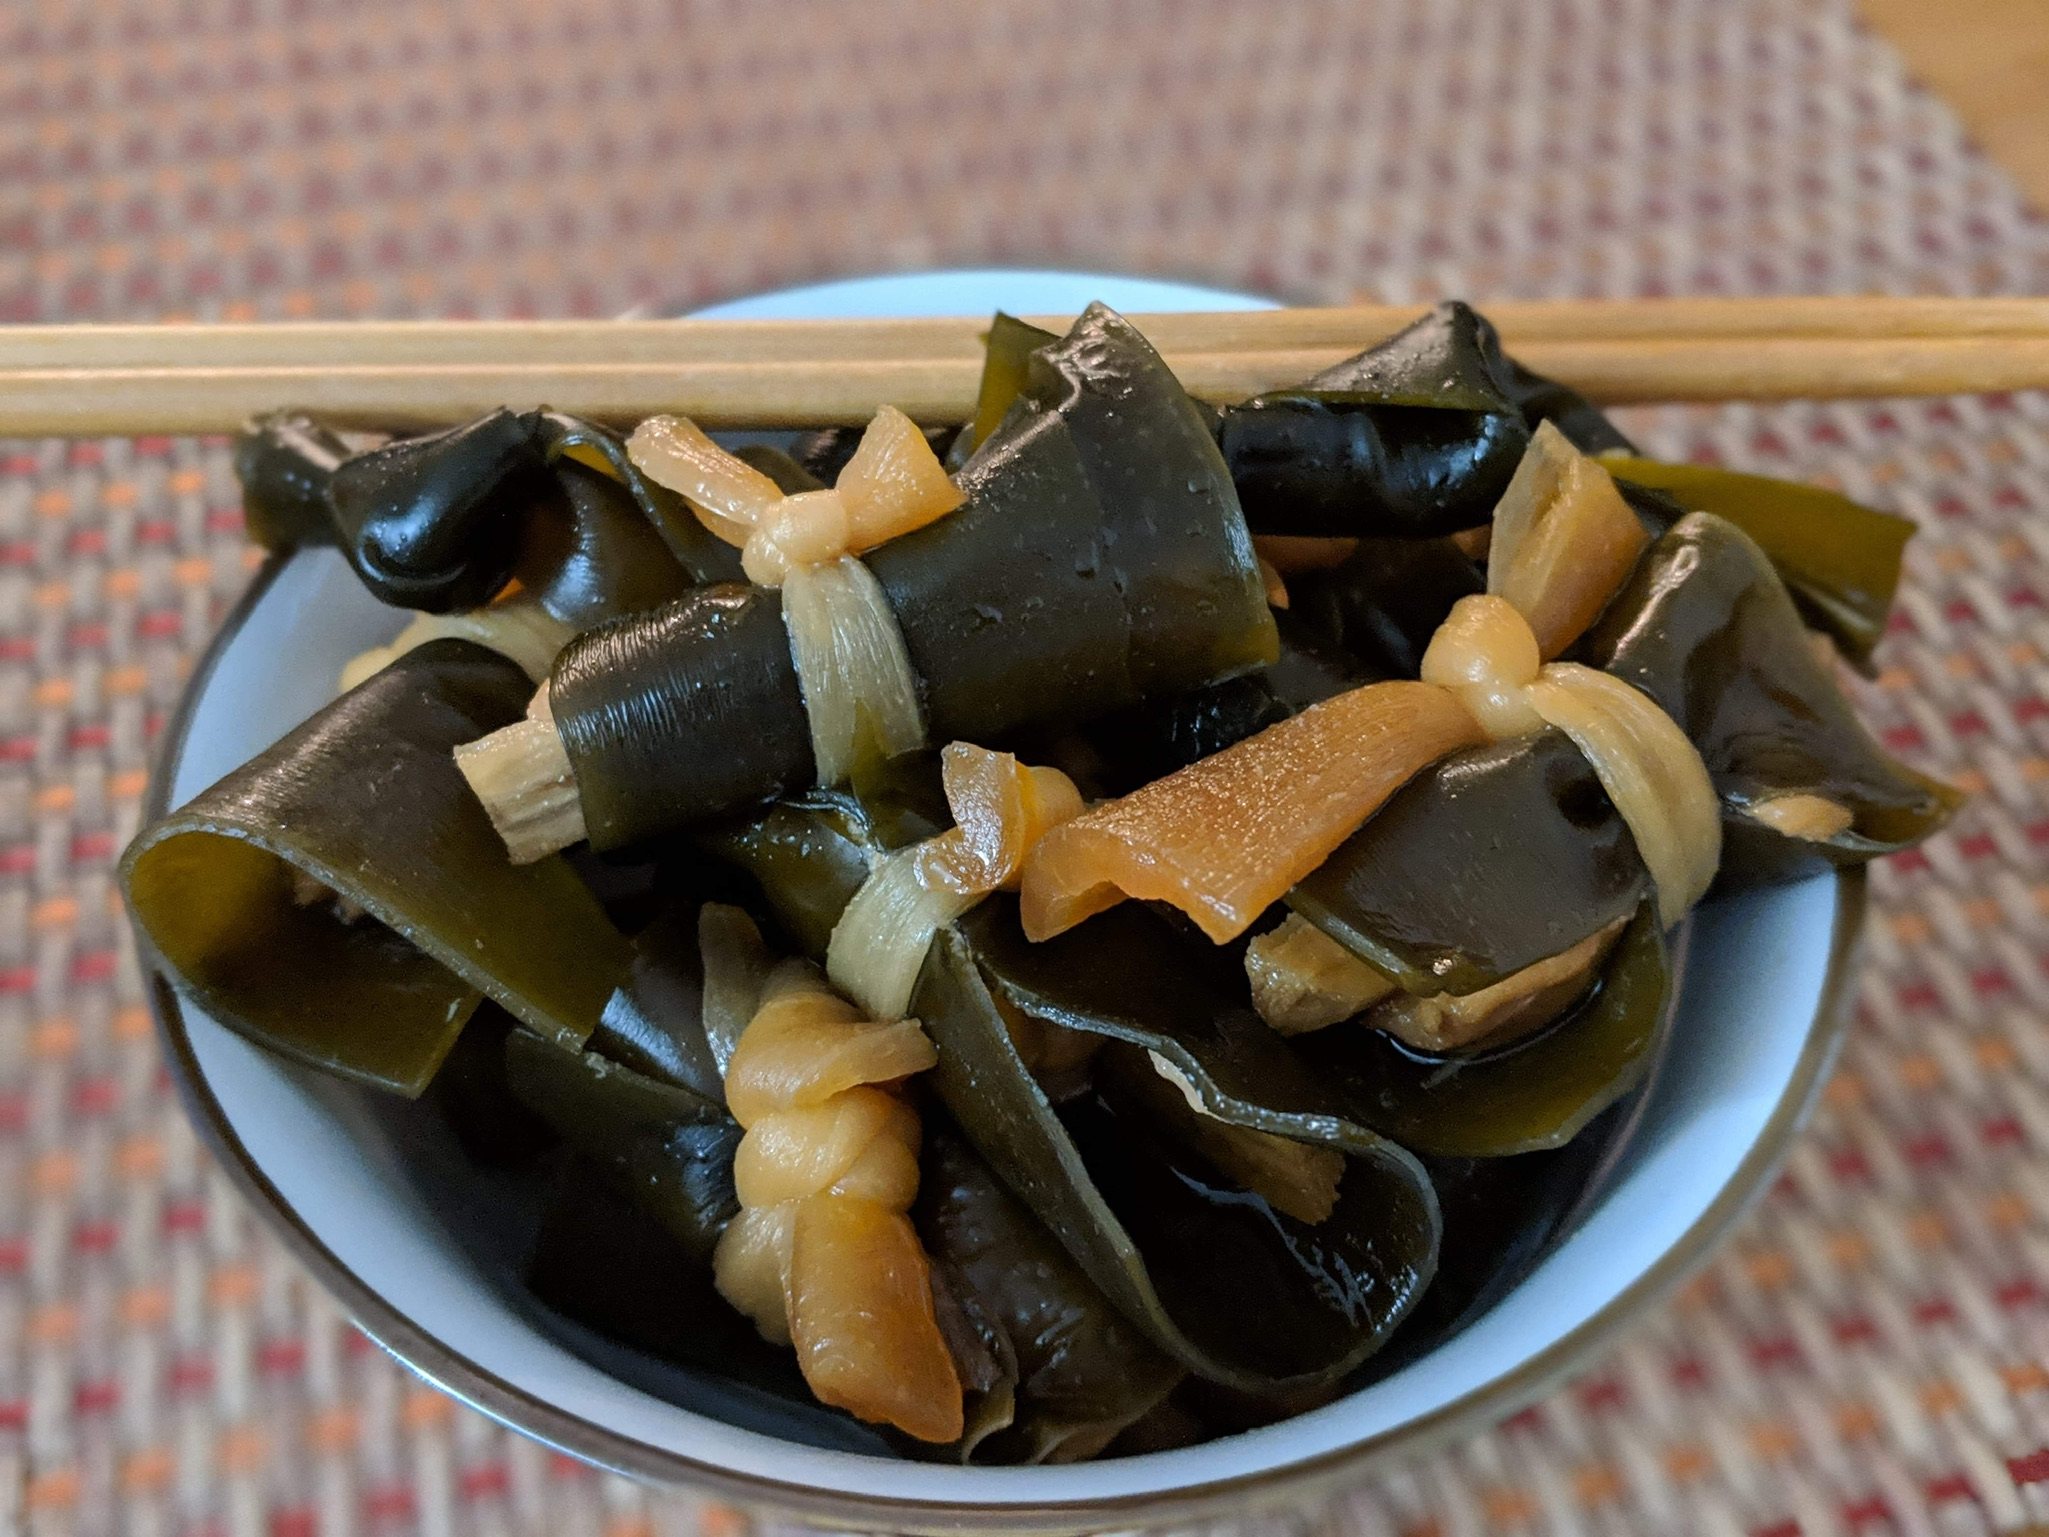 Time to enjoy the konbu maki. photo credit: lauren ho